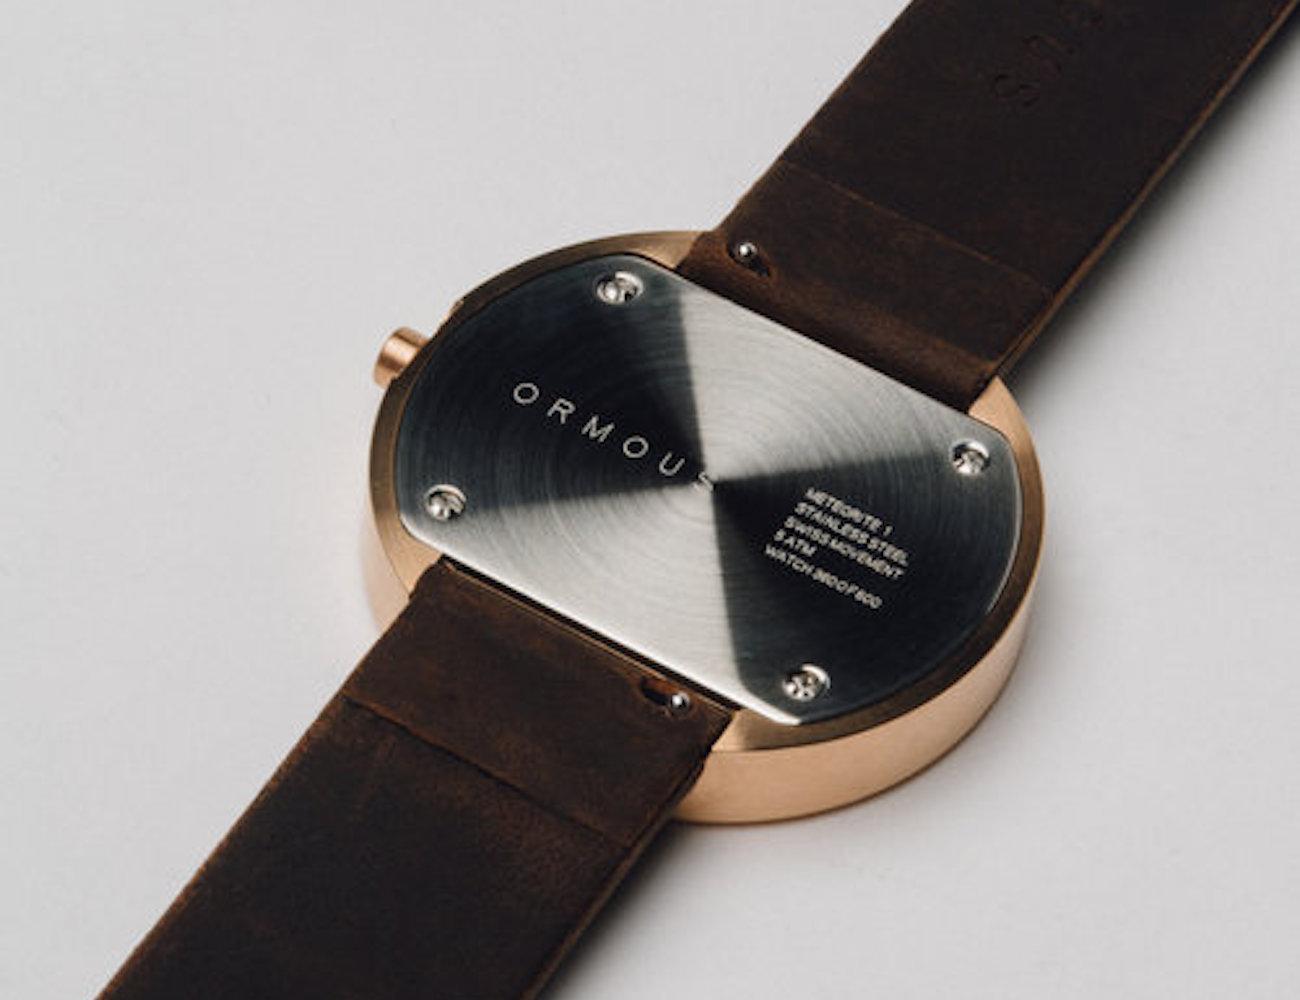 HISAKO Stainless Steel and Meteorite Unisex Watch